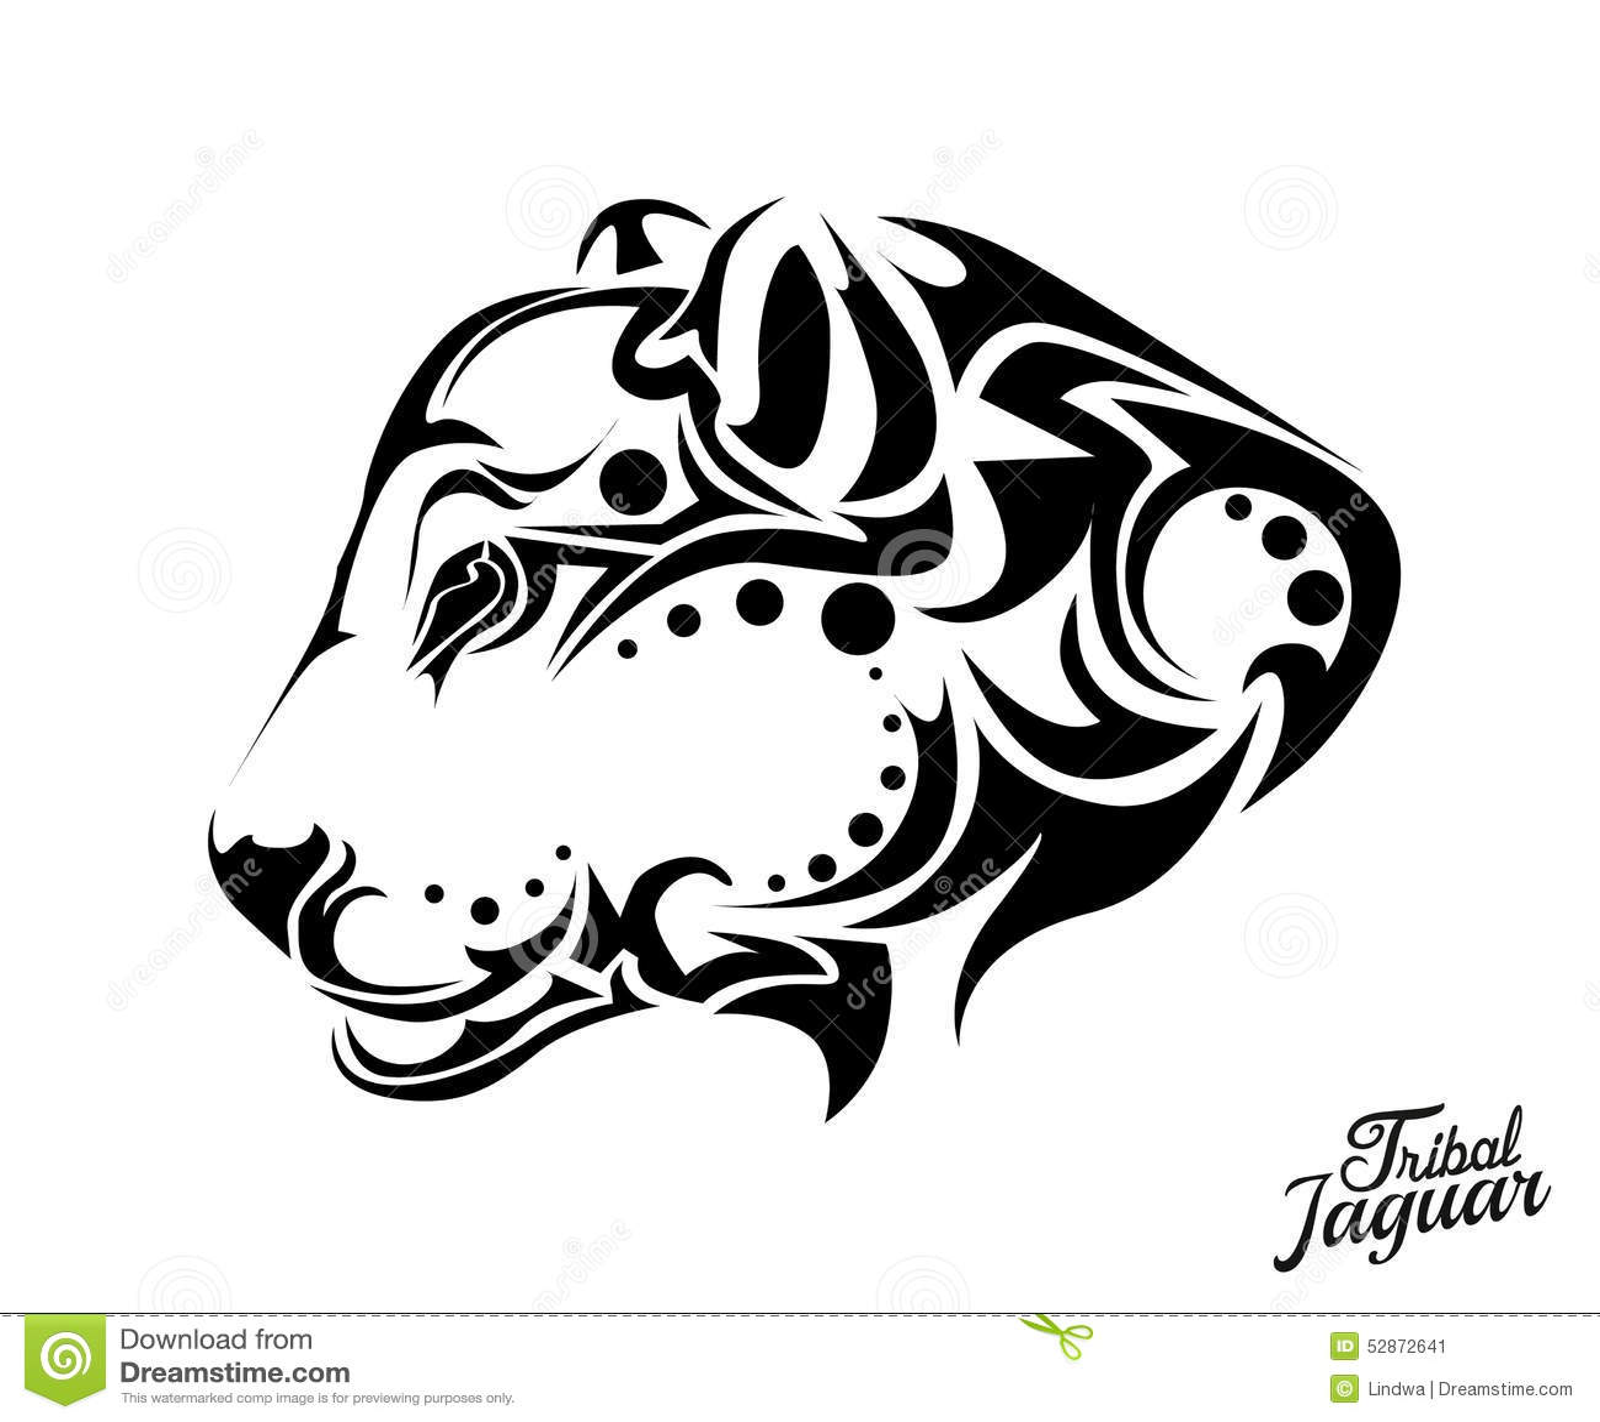 tribal jaguar tattoo stock vector  illustration of tattoo